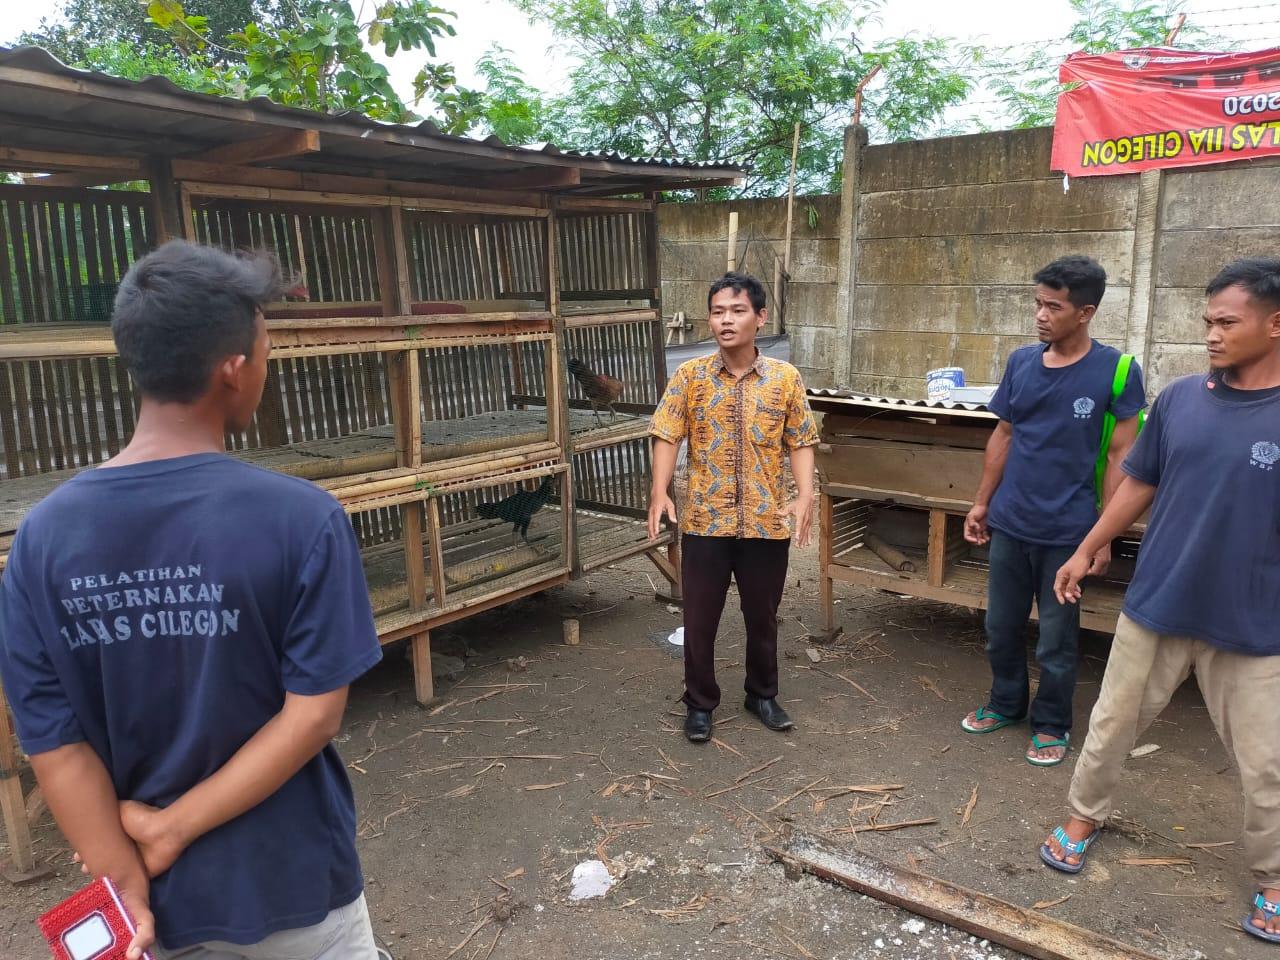 Gambar Tingkatkan Pembinaan Kemandirian, Lapas Cilegon Berikan Pelatihan Peternakan Ayam bagi WBP 17